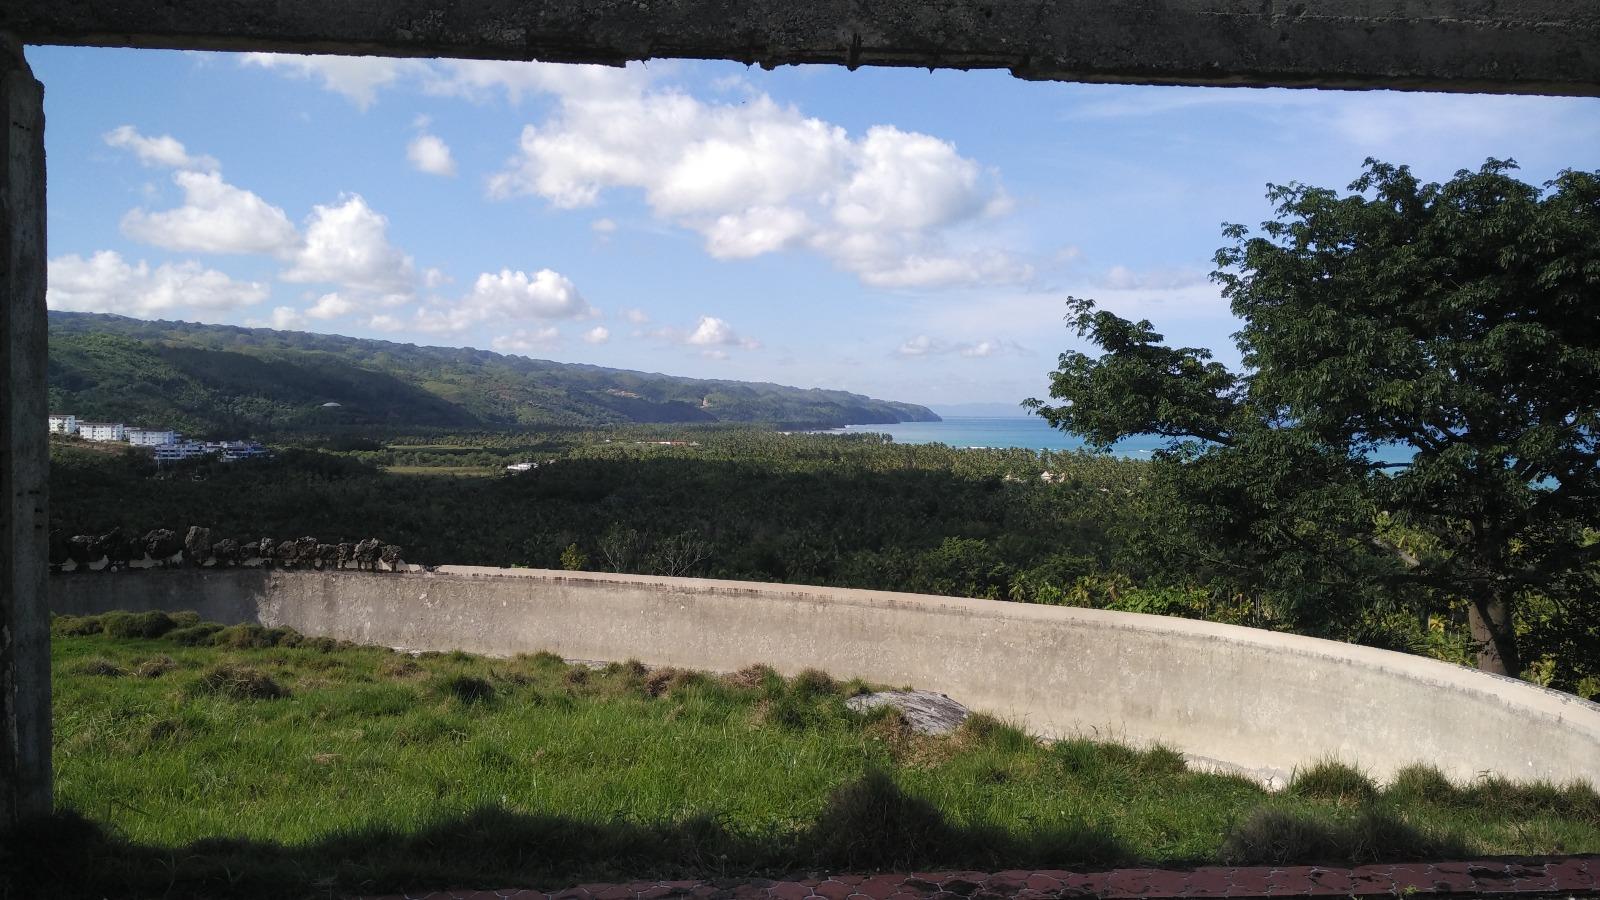 Hill for sale in Las Terrenas Dominican republic 3.jpeg